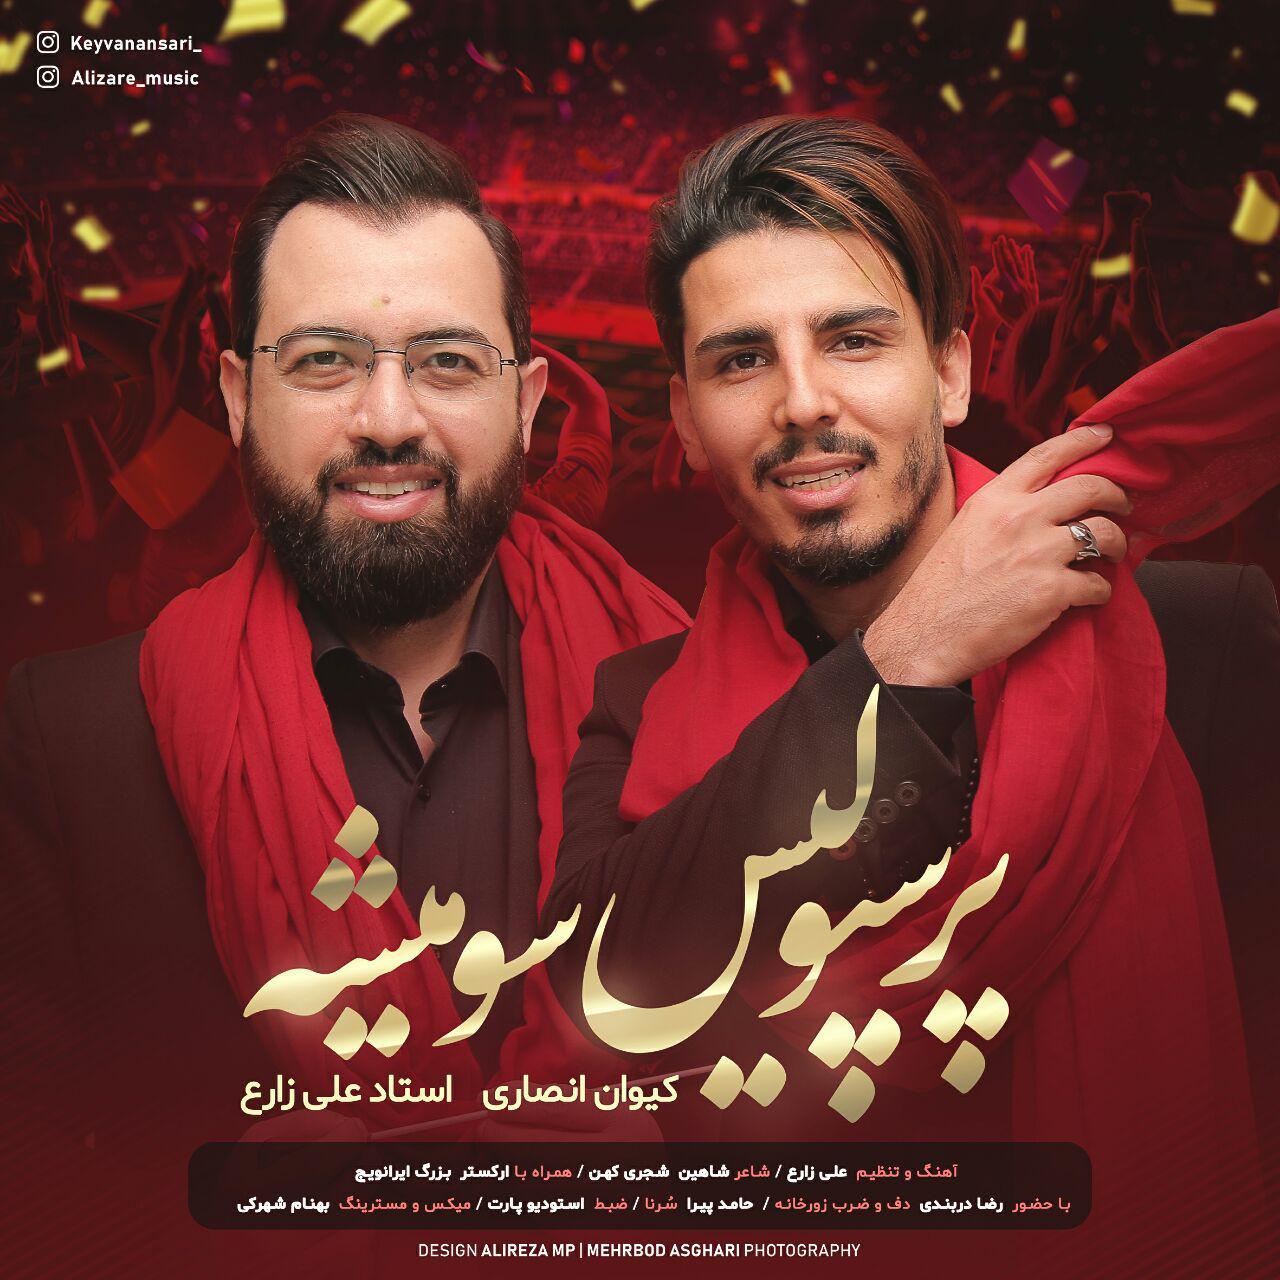 Keyvan Ansari And Ali Zare - Perspolis Sevomishe Music   آهنگ کیوان انصاری و علی زارع - پرسپولیس سومیشه